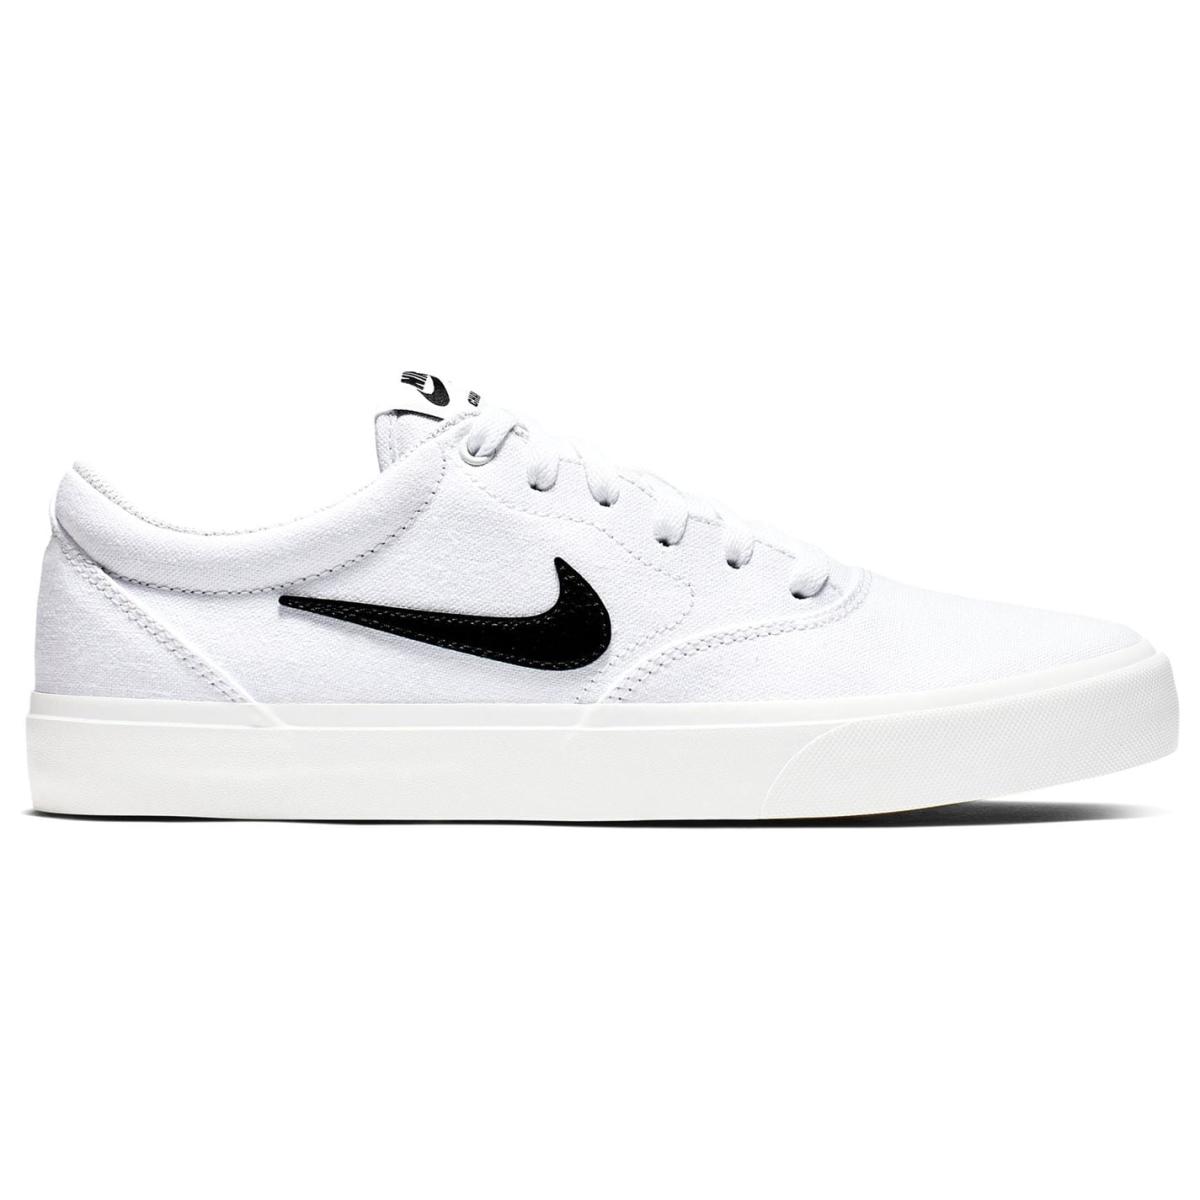 Nike-SB-Lot-Solarsoft-Skate-Chaussures-Messieurs-Skater-Chaussures-De-Sport-Skate-2162 miniature 66